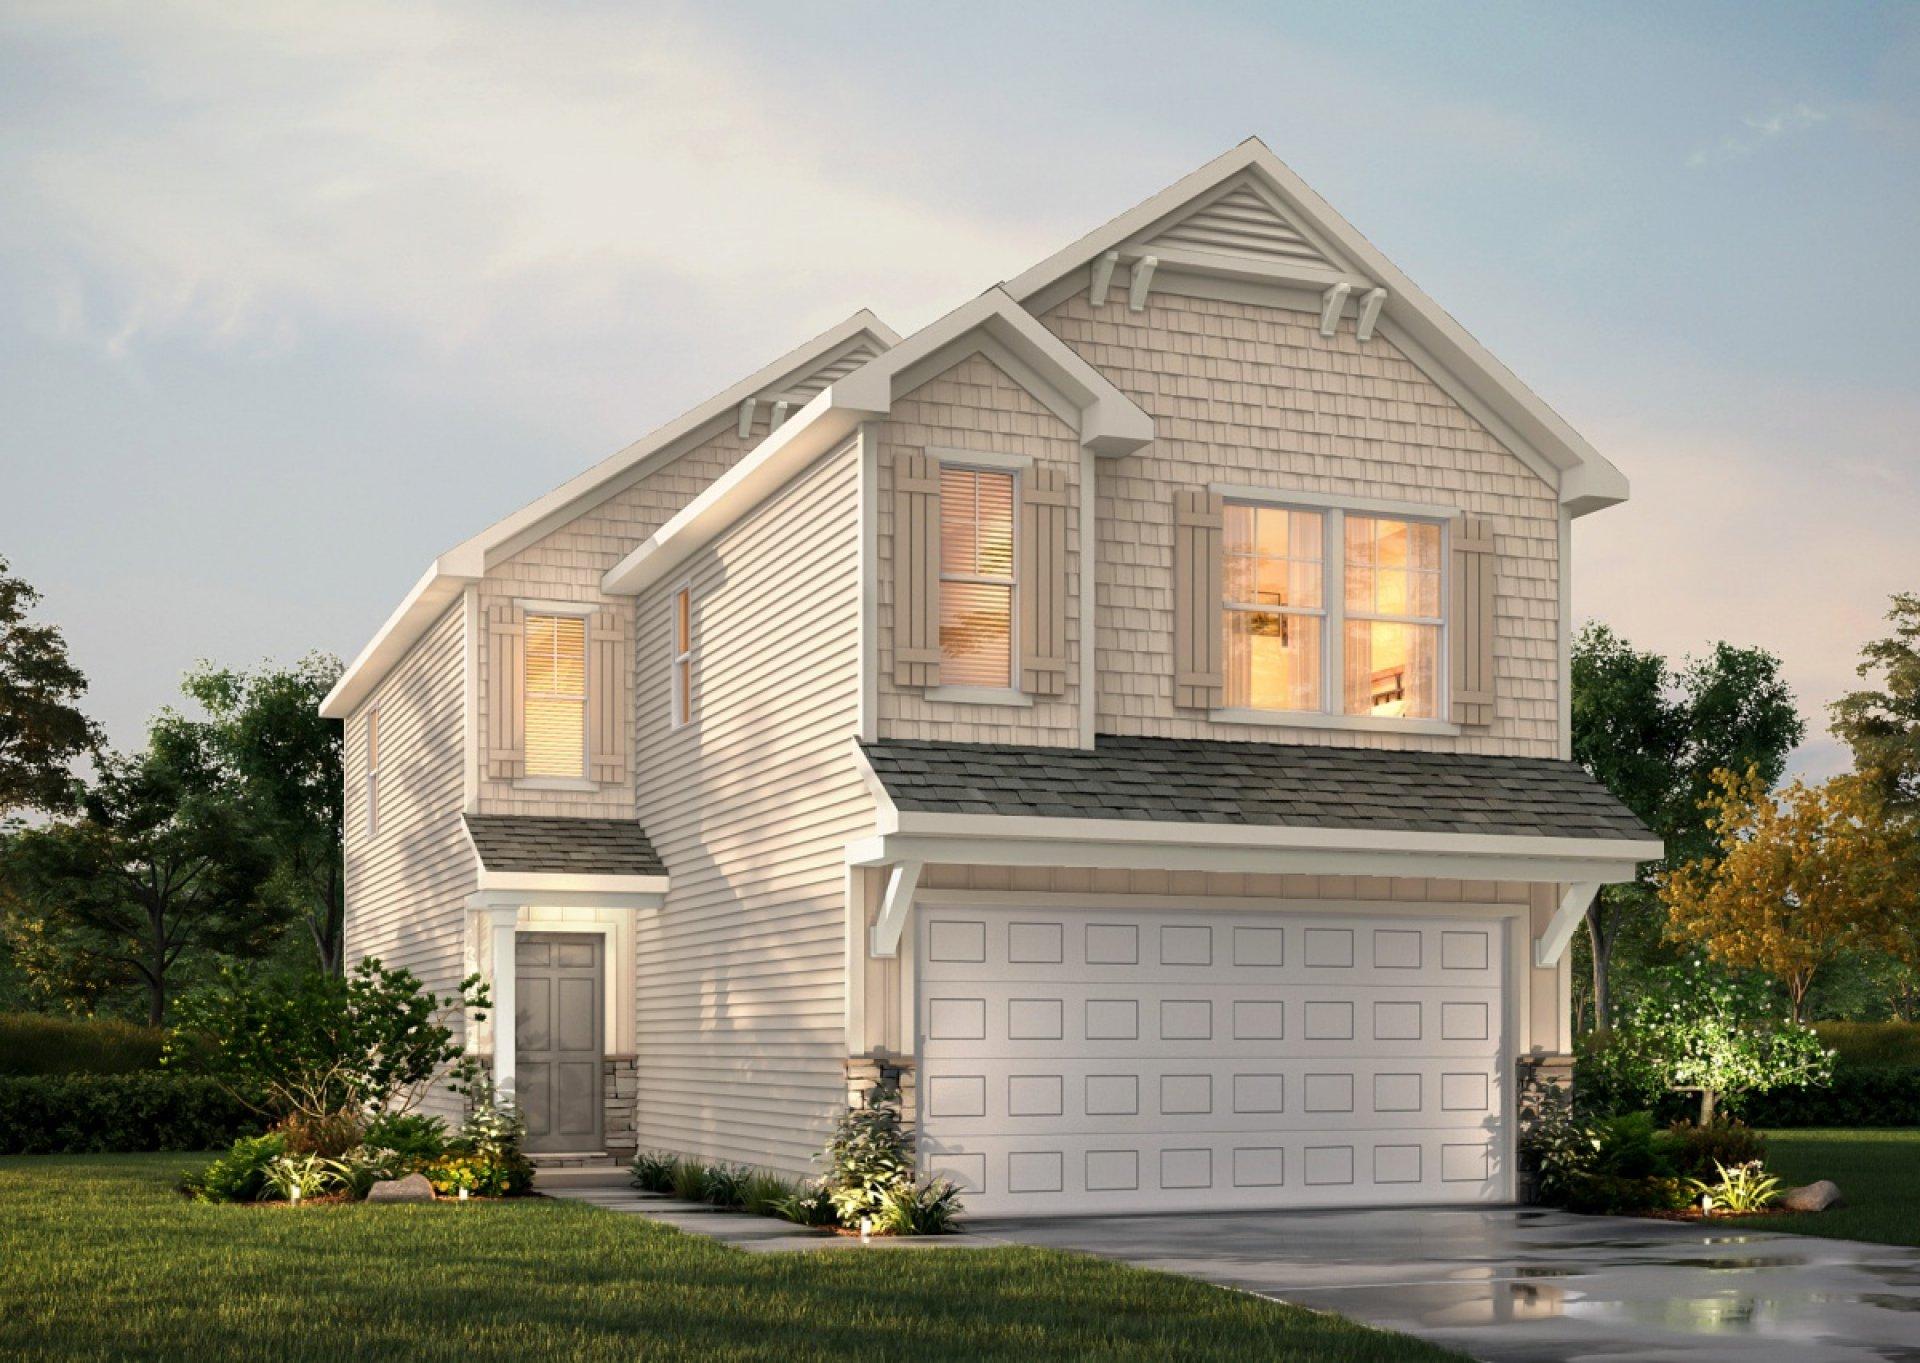 True Homes|New House For Sale Winston-Salem